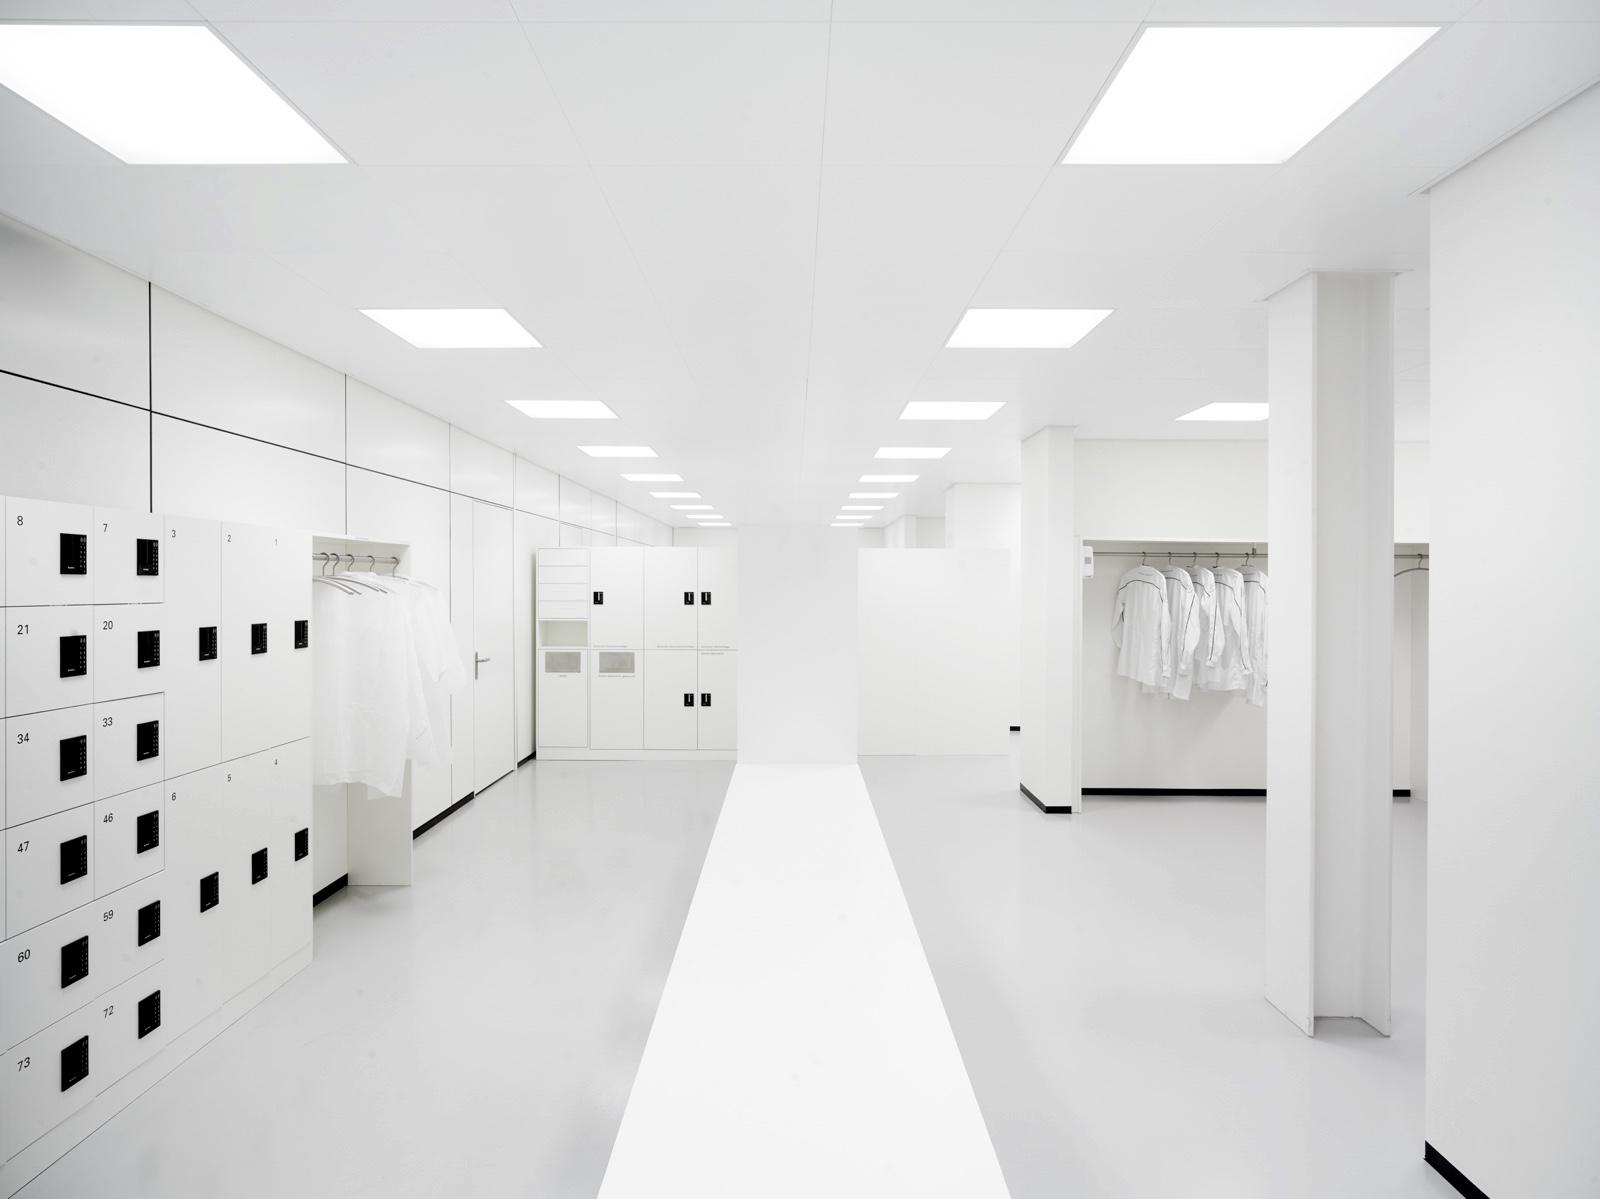 IWC Manufakturzentrum Vestuarios